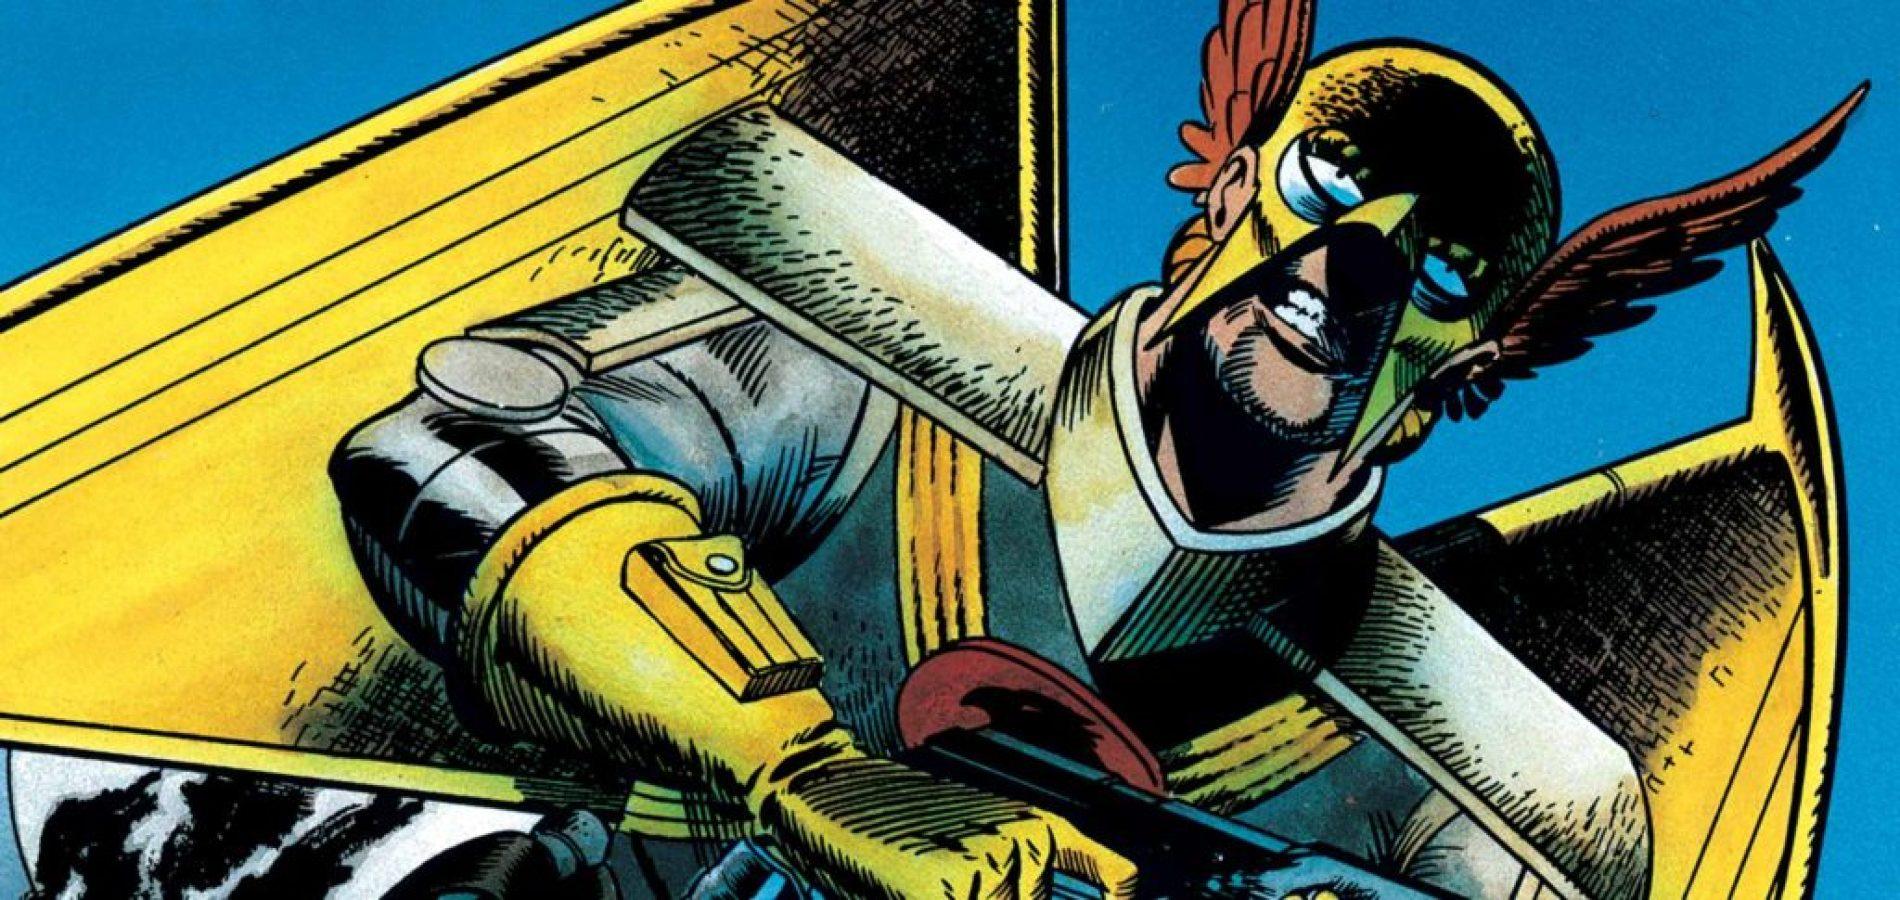 Hawkworld comic book miniseries